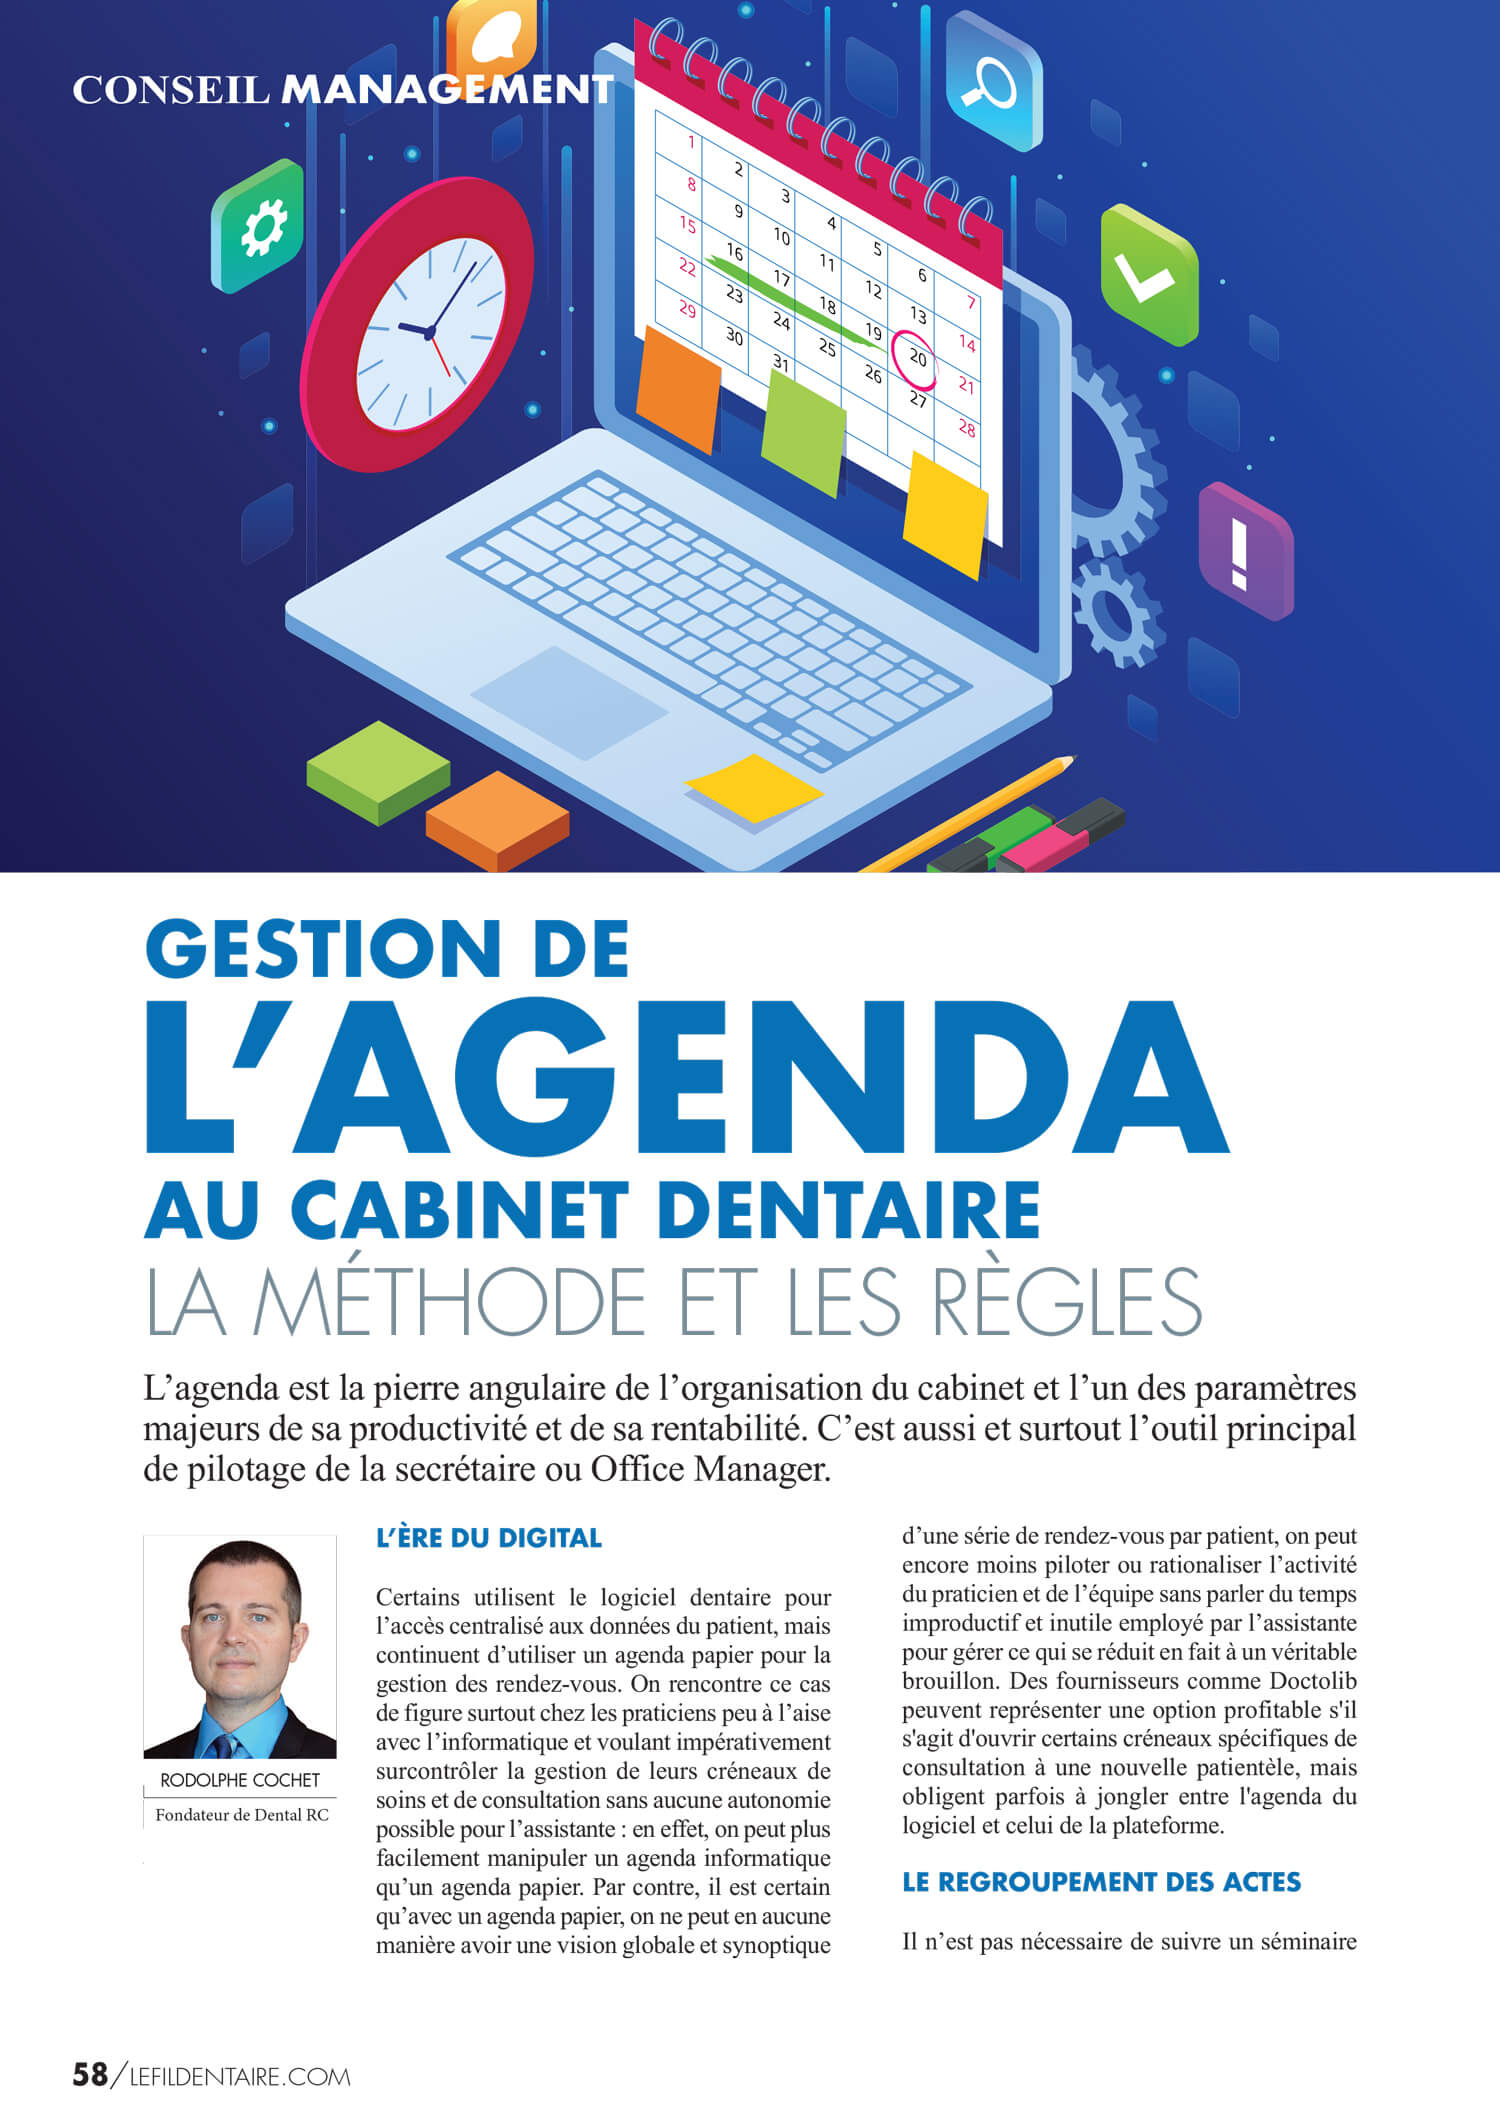 Gestion_agenda_au_cabinet_dentaire_methode_et_regles_Rodolphe_Cochet.jpg